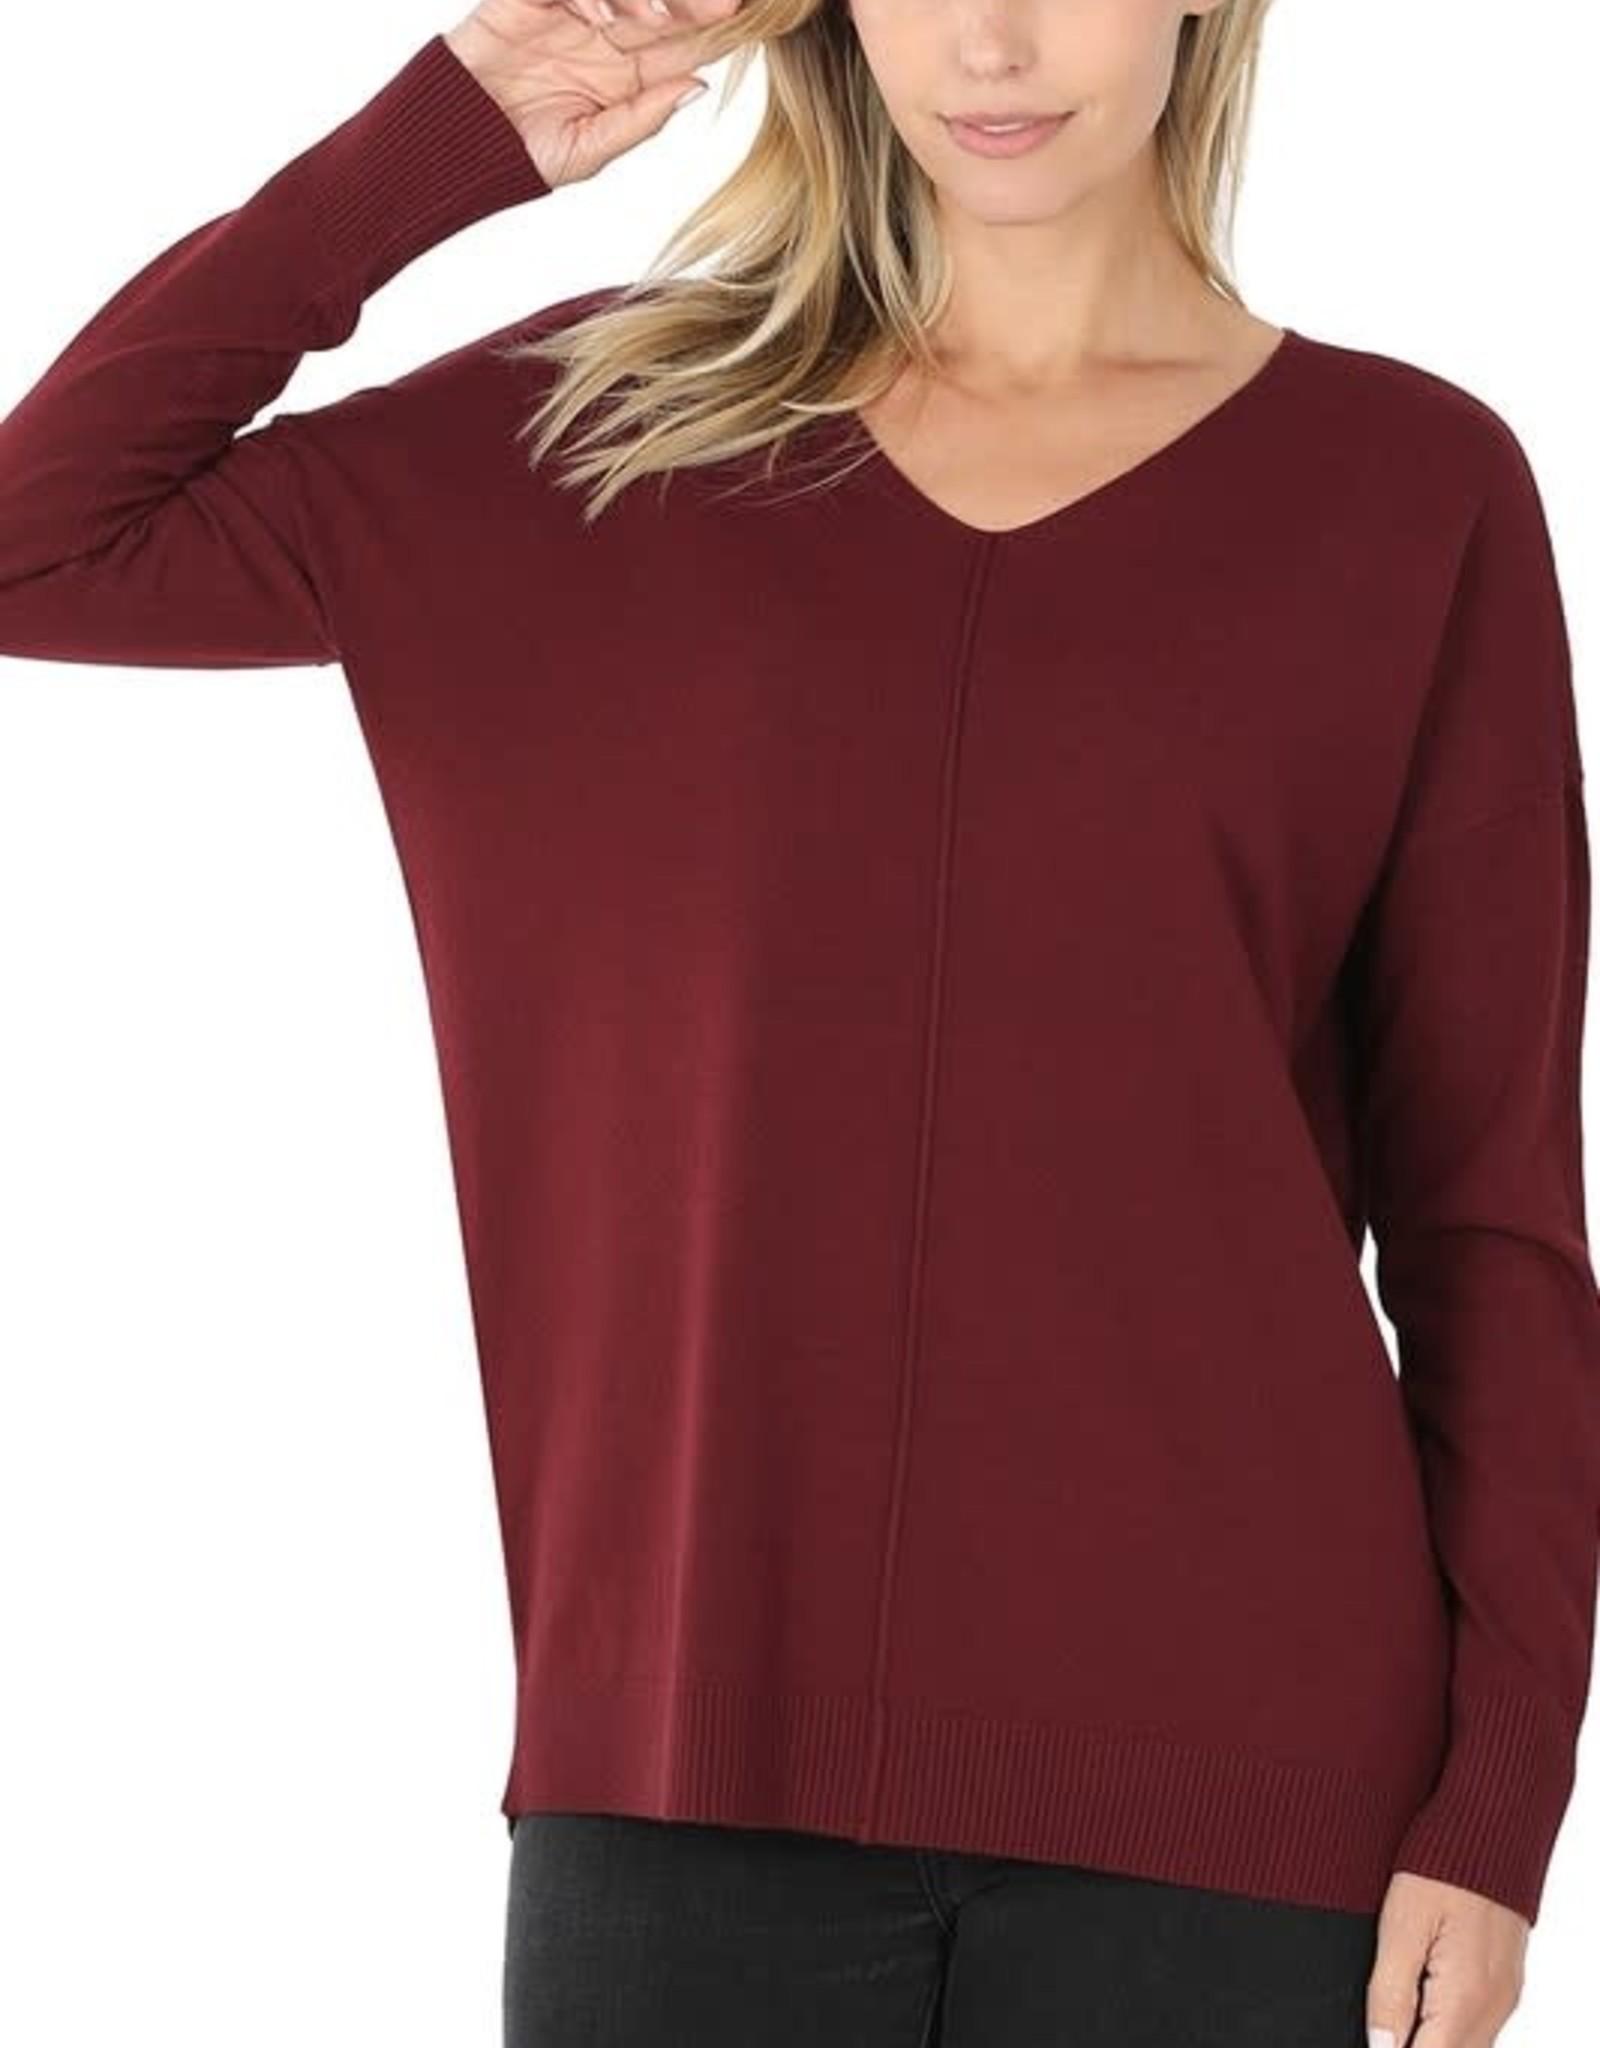 - Dark Burgundy V-Neck Sweater w/Center Seam